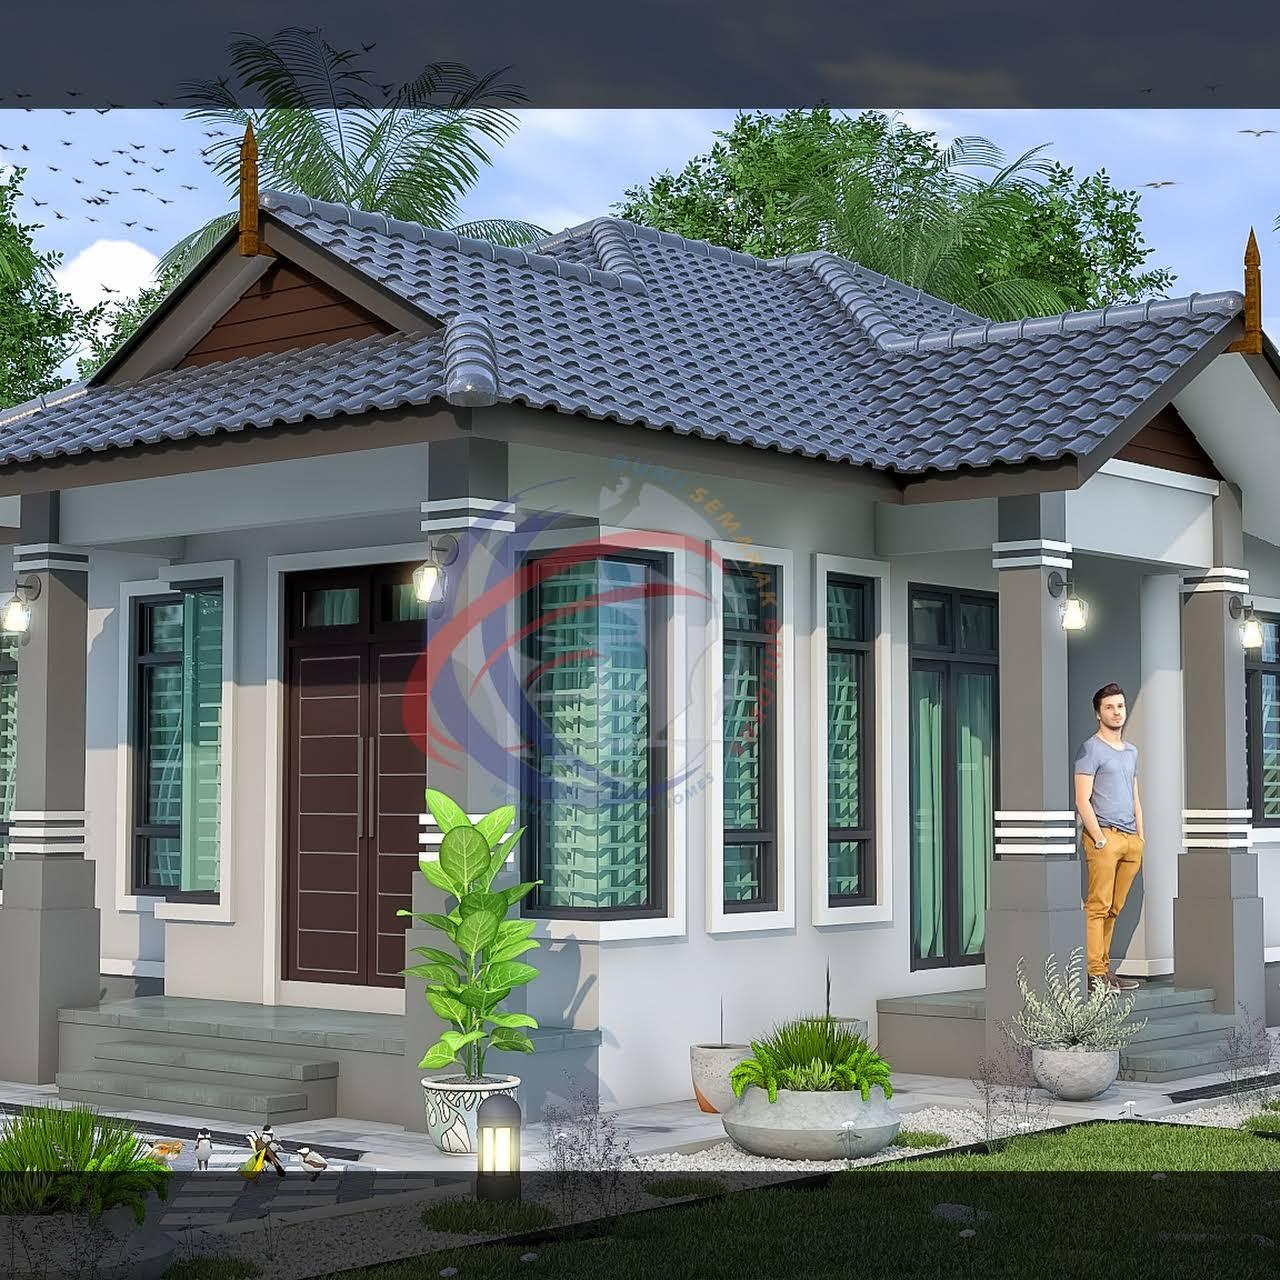 Bumi Semarak Builders Kontraktor Bina Rumah Atas Tanah Sendiri Negeri Kelantan Kontraktor Pembinaan Di Kota Bharu